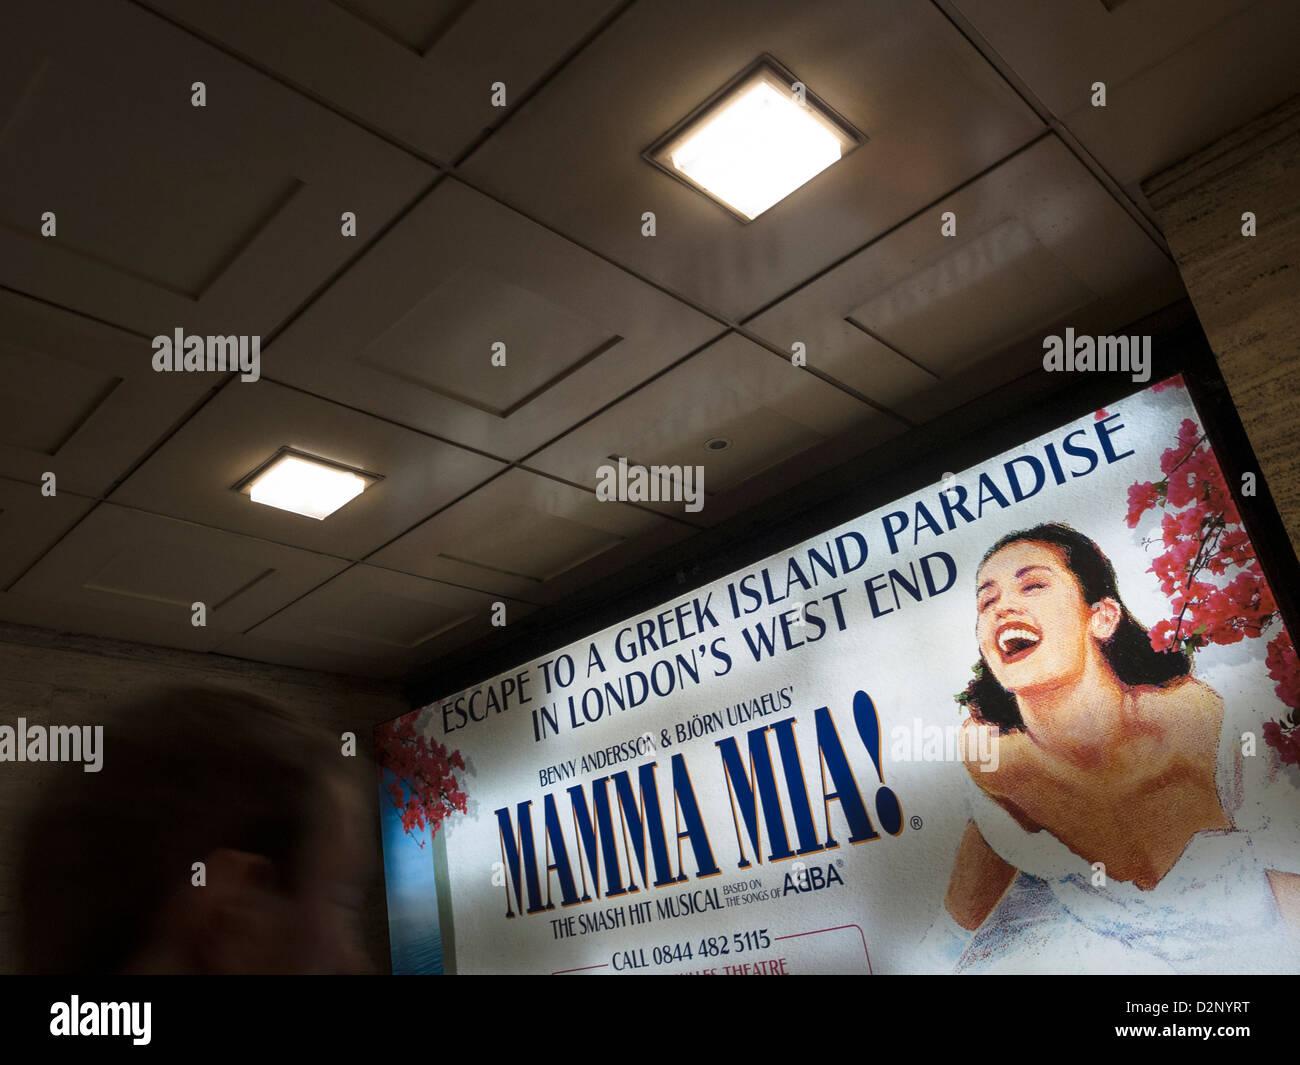 mamma Mia! poster in london underground - Stock Image